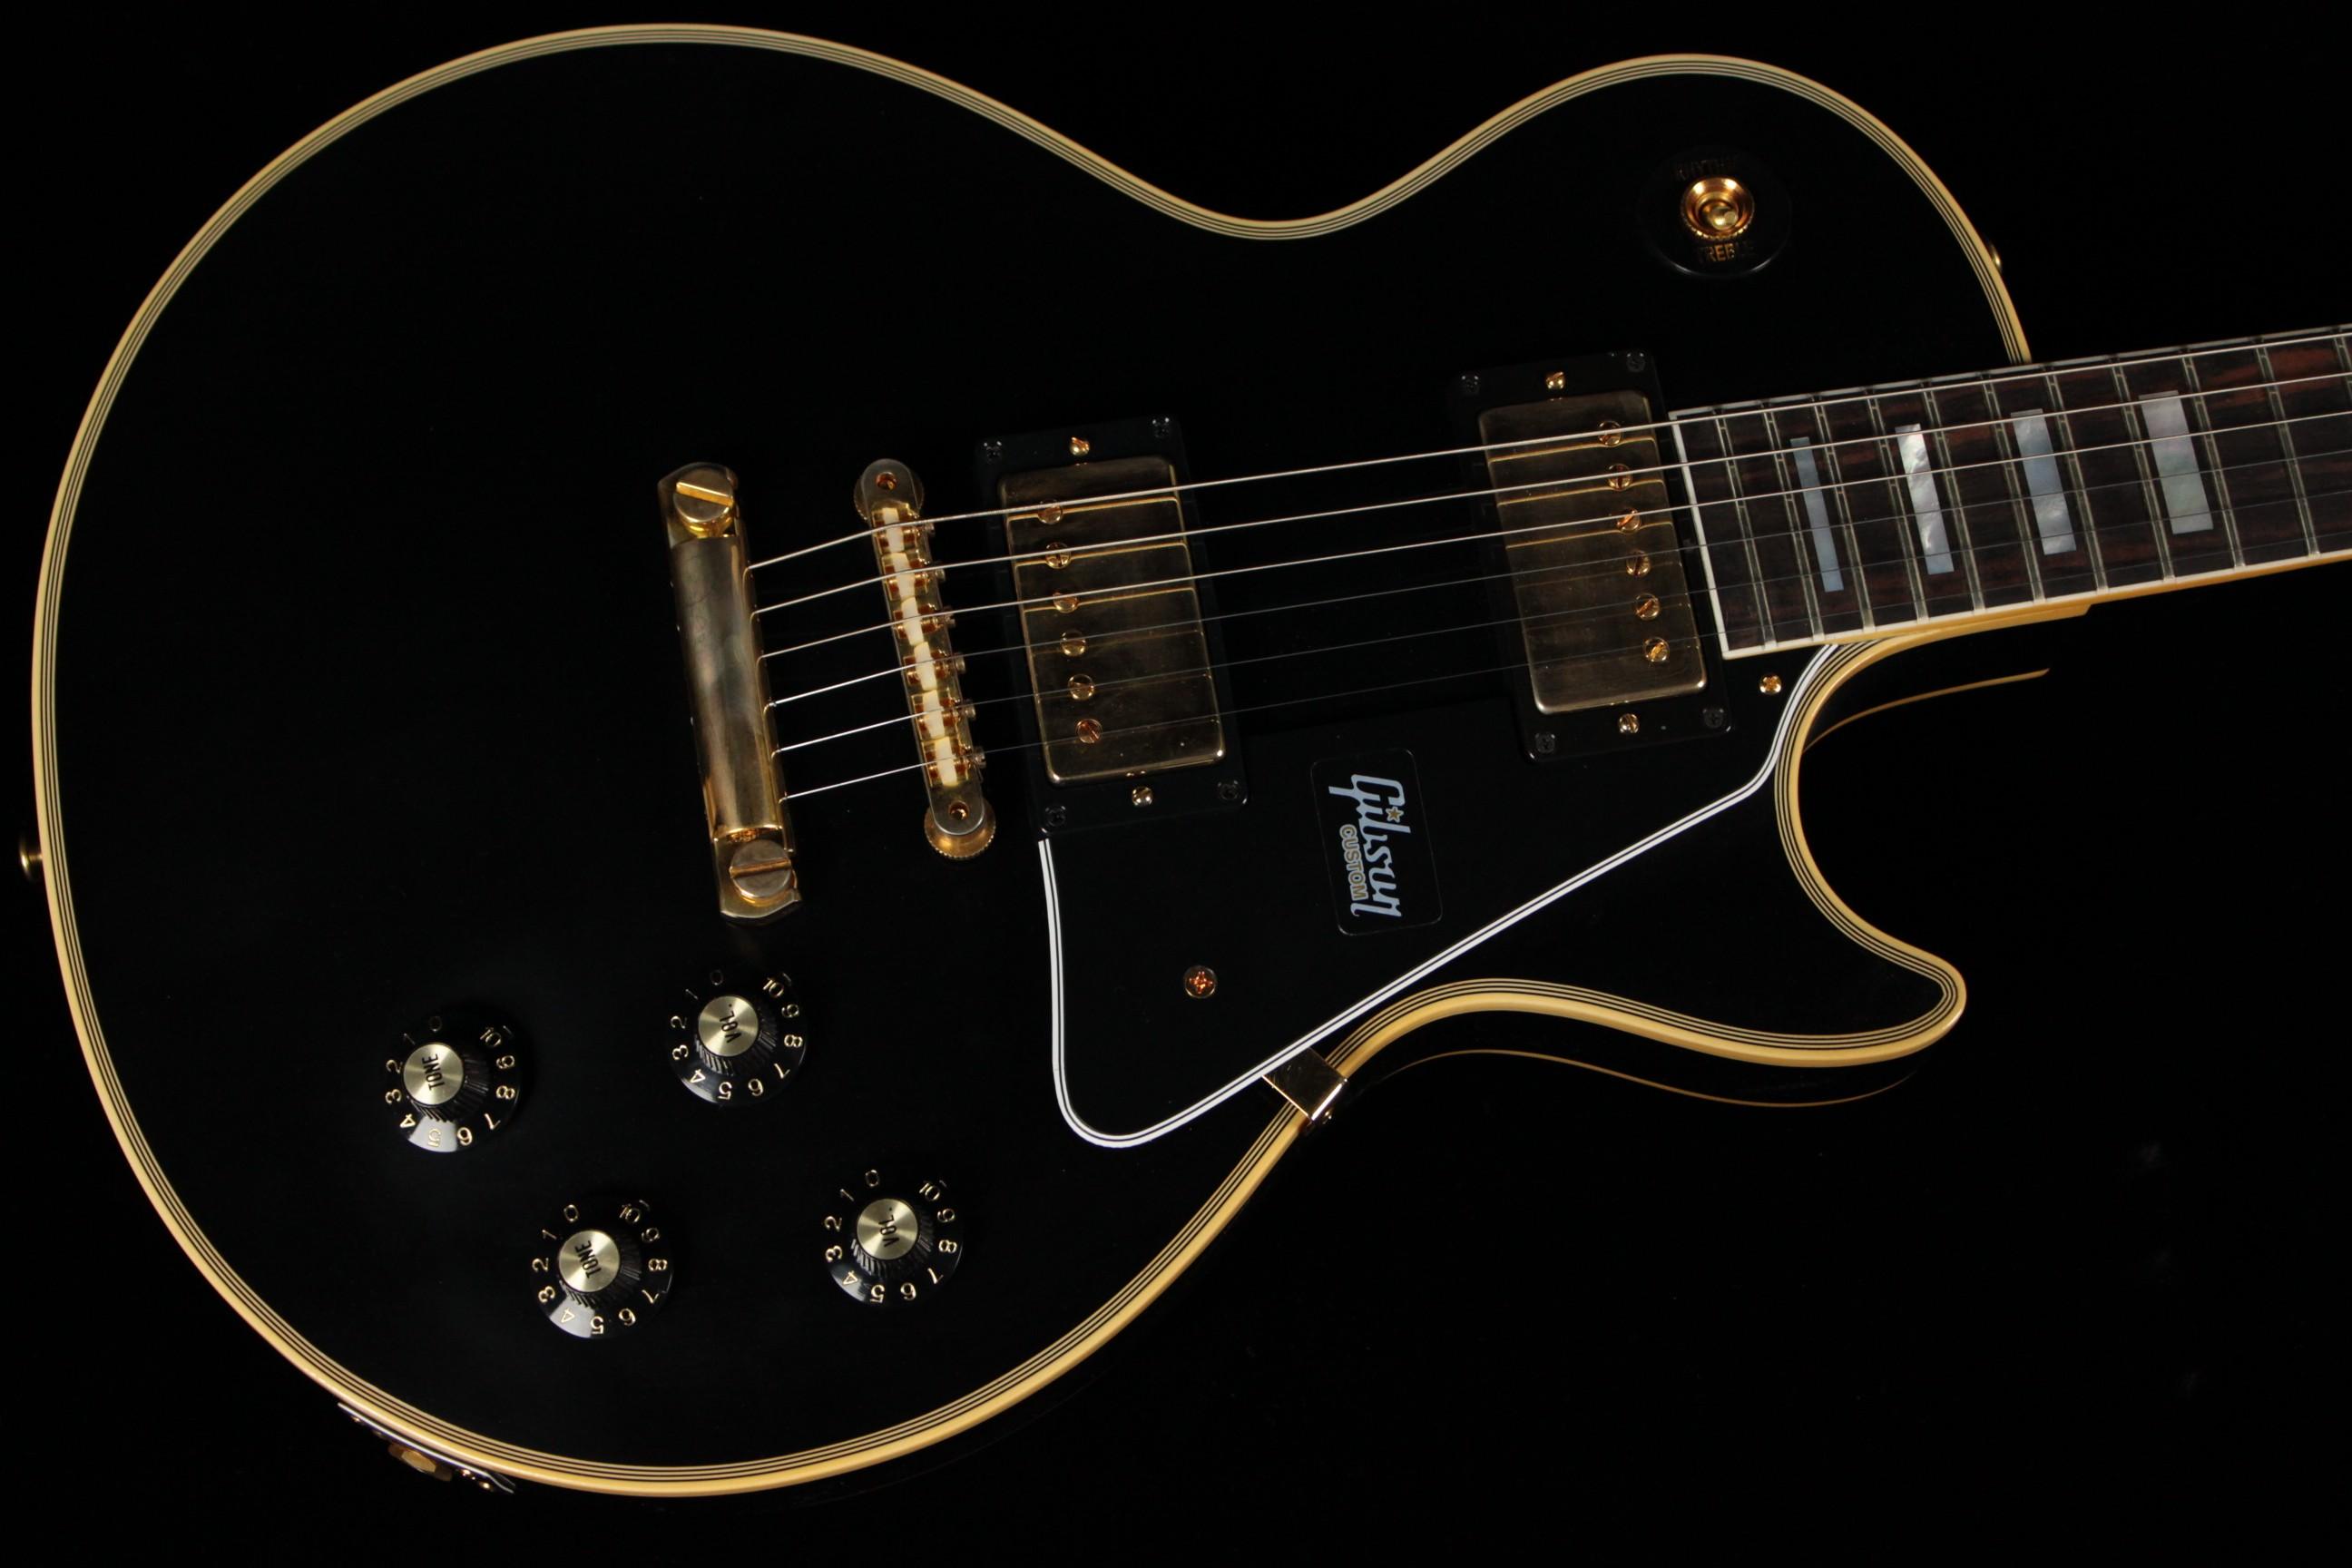 Gibson Custom 50th Anniversary 1968 Les Paul Custom VOS